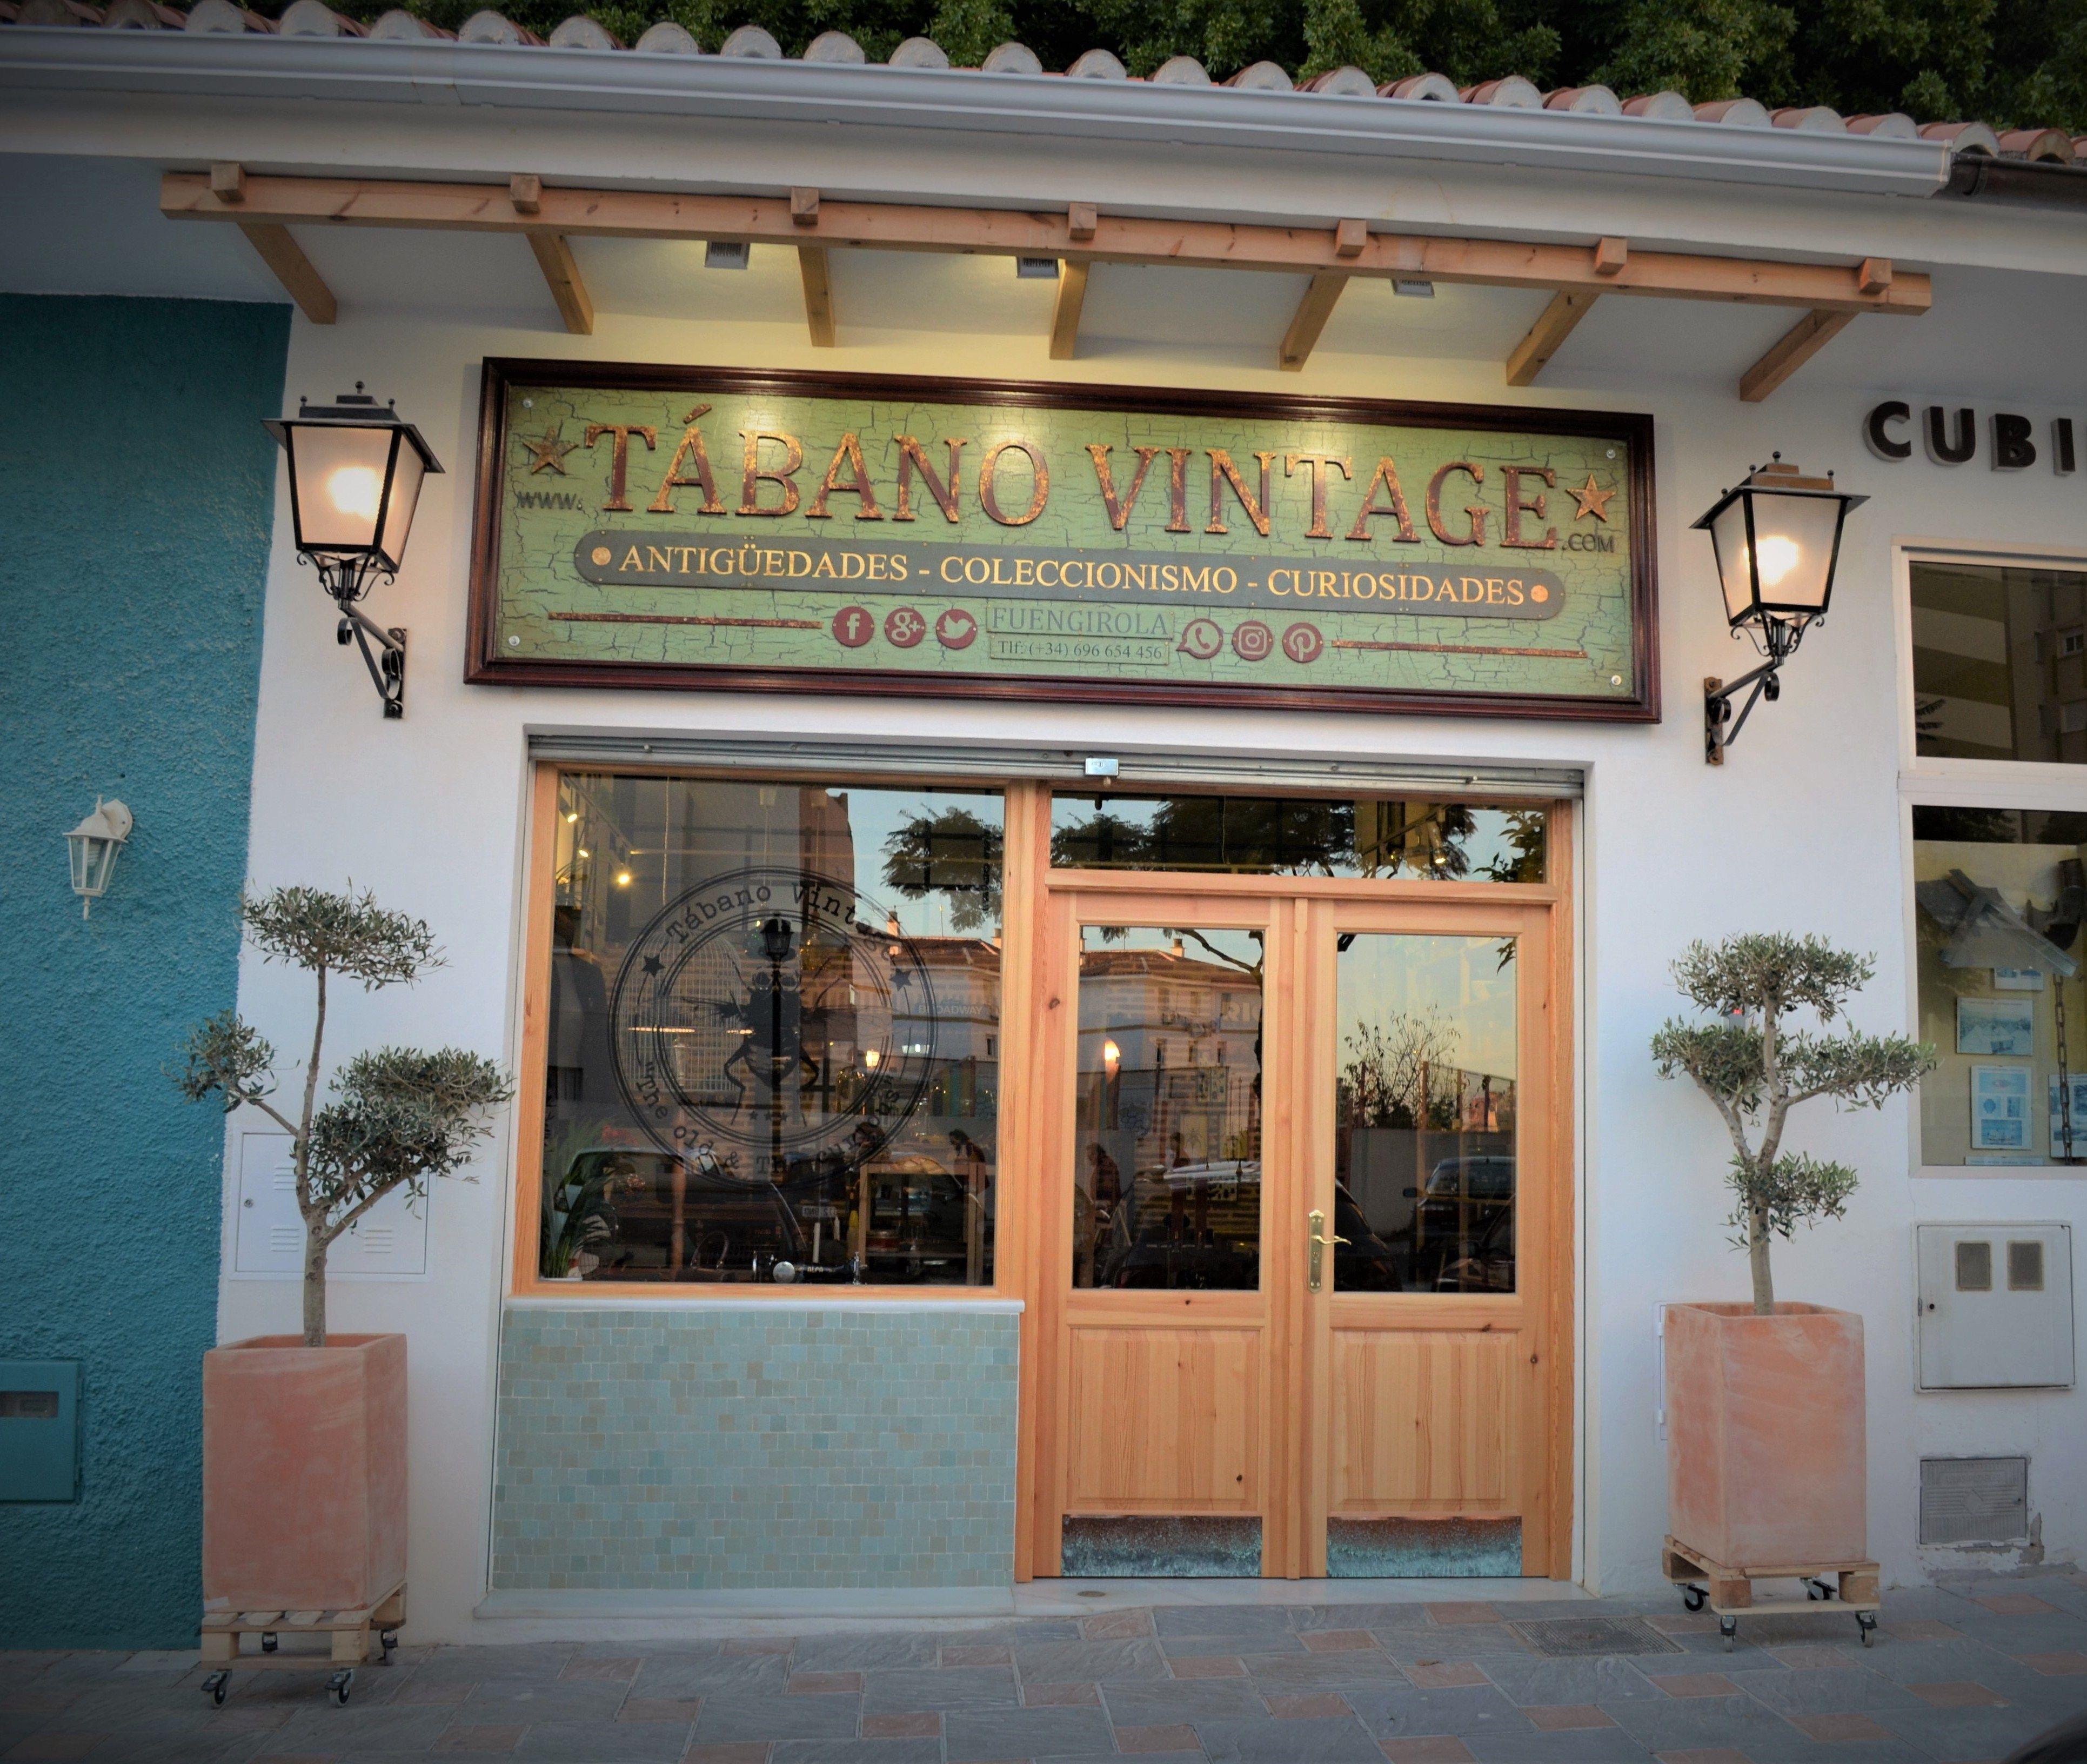 Muebles Malaga Spain - Venta Y Alquiler De Muebles Y Decoraci N Vintage Antig Edades [mjhdah]http://www.aaltofurniture.com/wp-content/uploads/2015/09/6.jpg